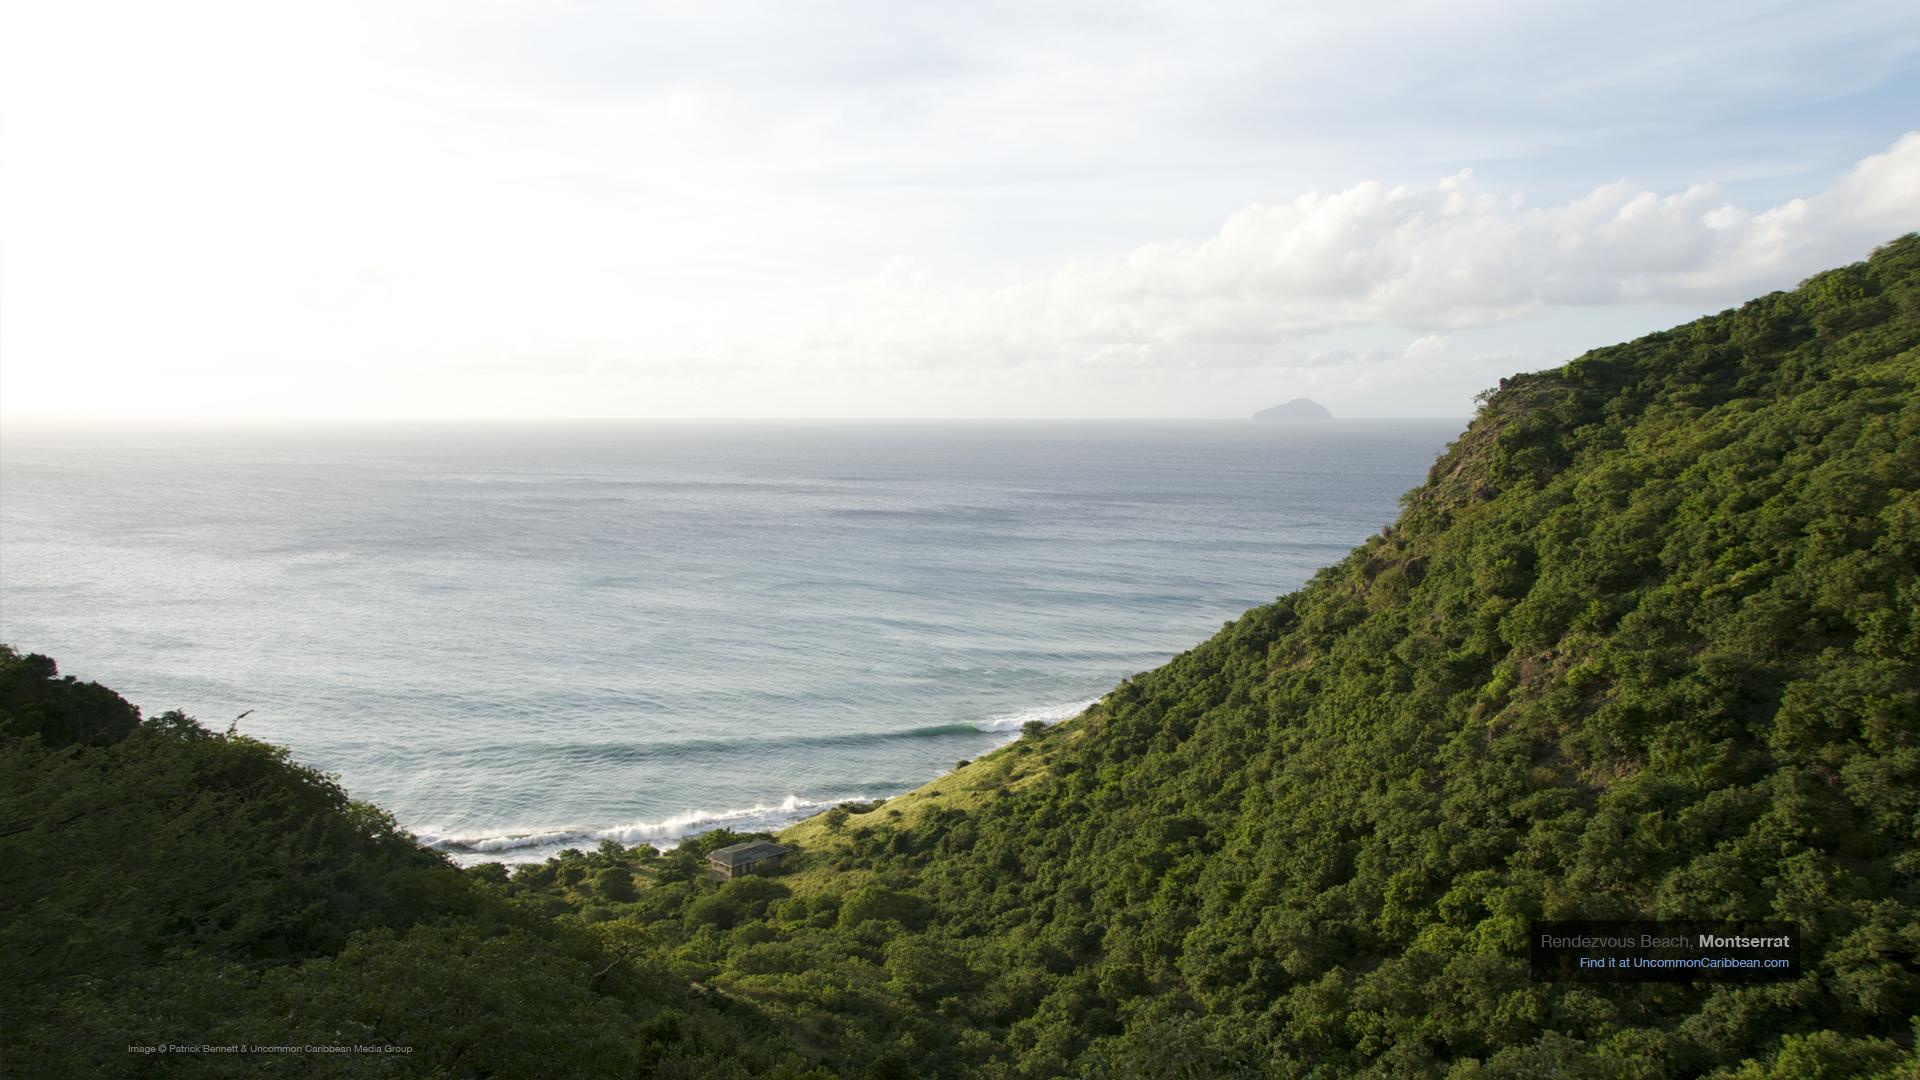 Caribbean Wallpaper: Montserrat's Rendezvous Beach